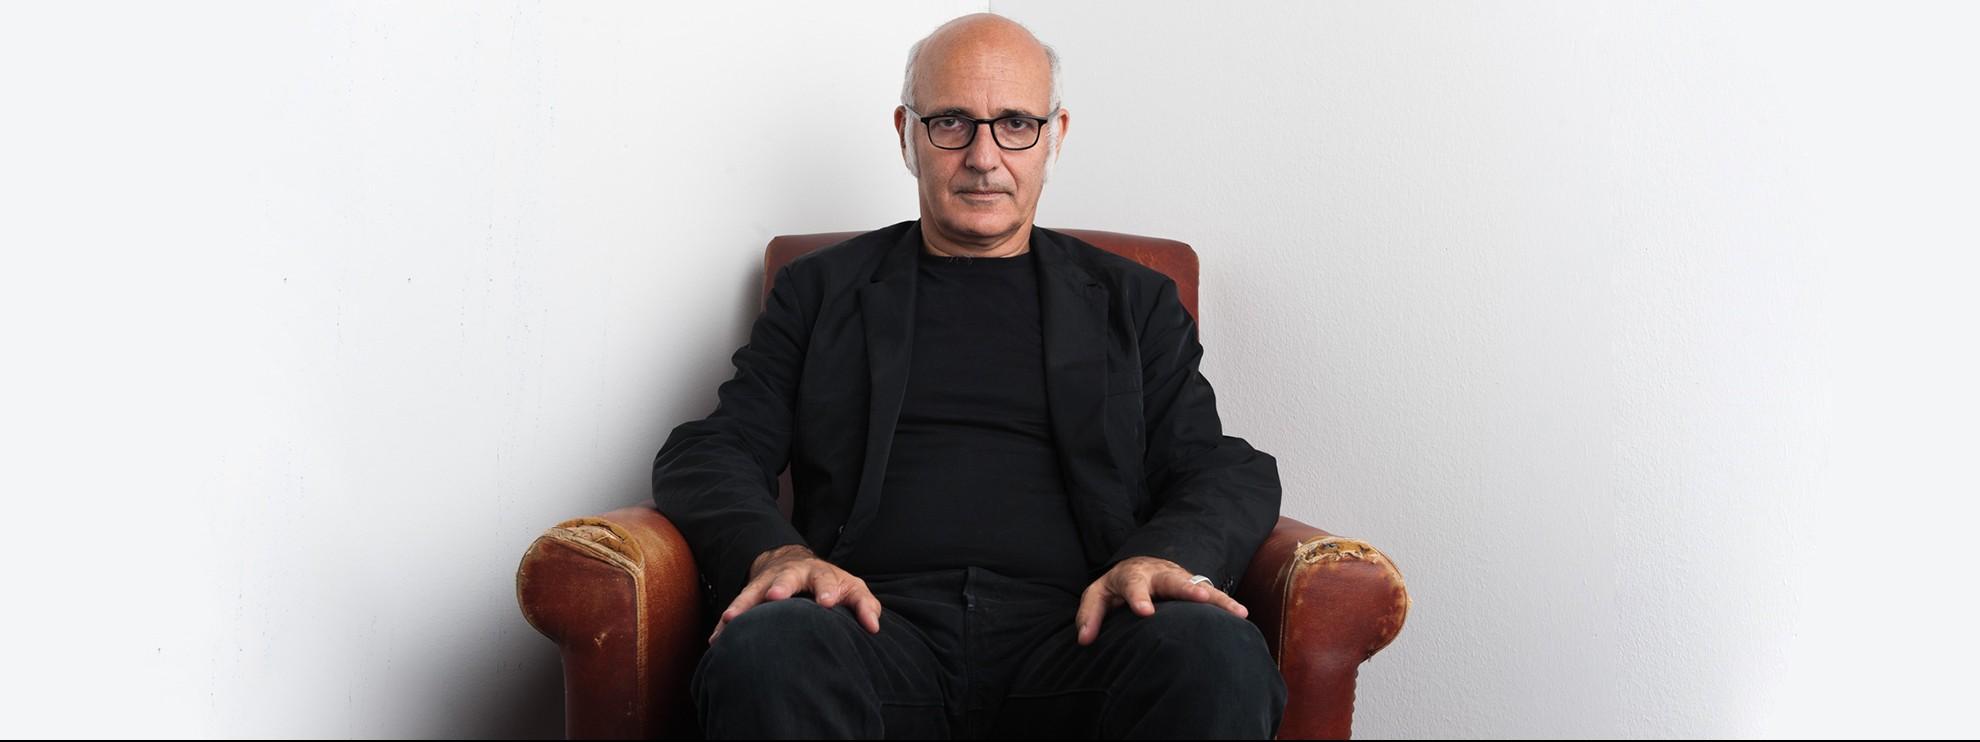 performer Ludovico Einaudi